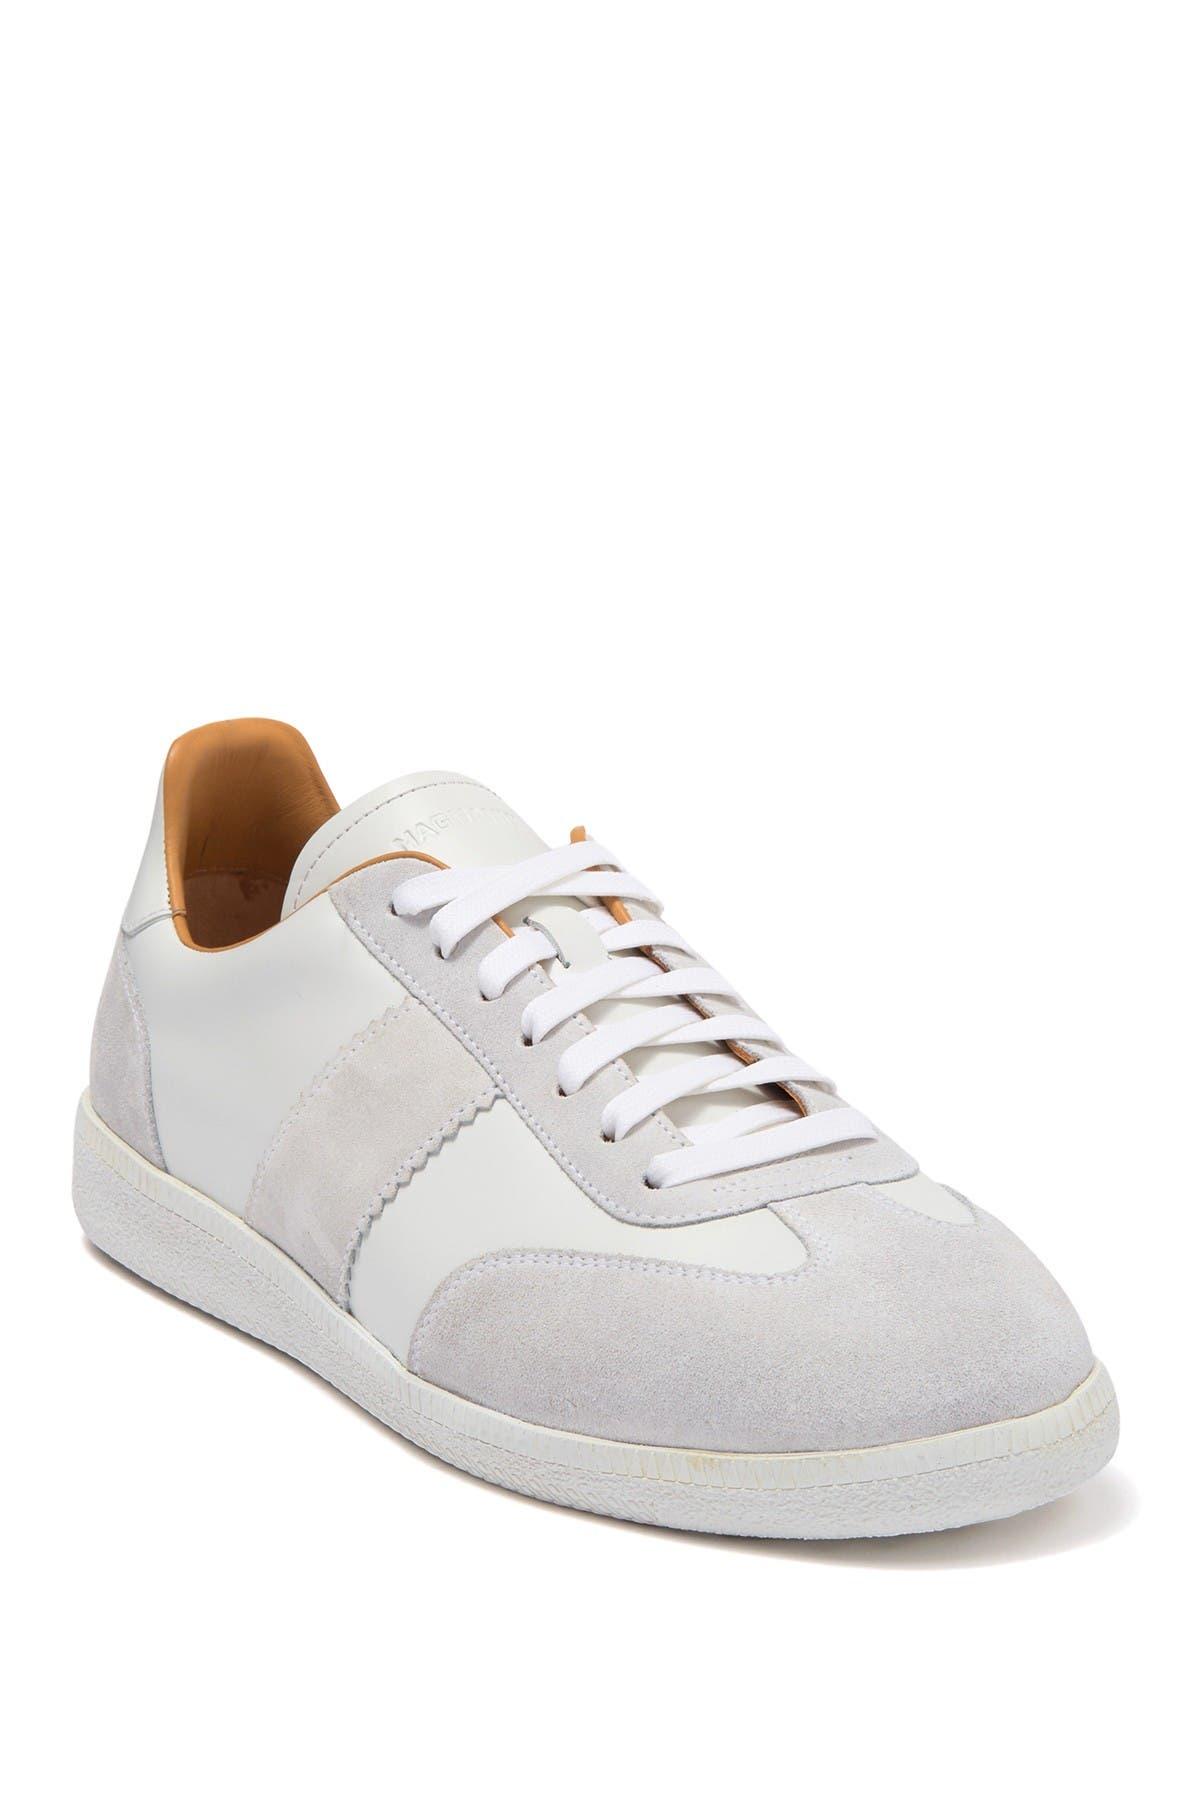 Image of Magnanni Lakewood Colorblock Sneaker